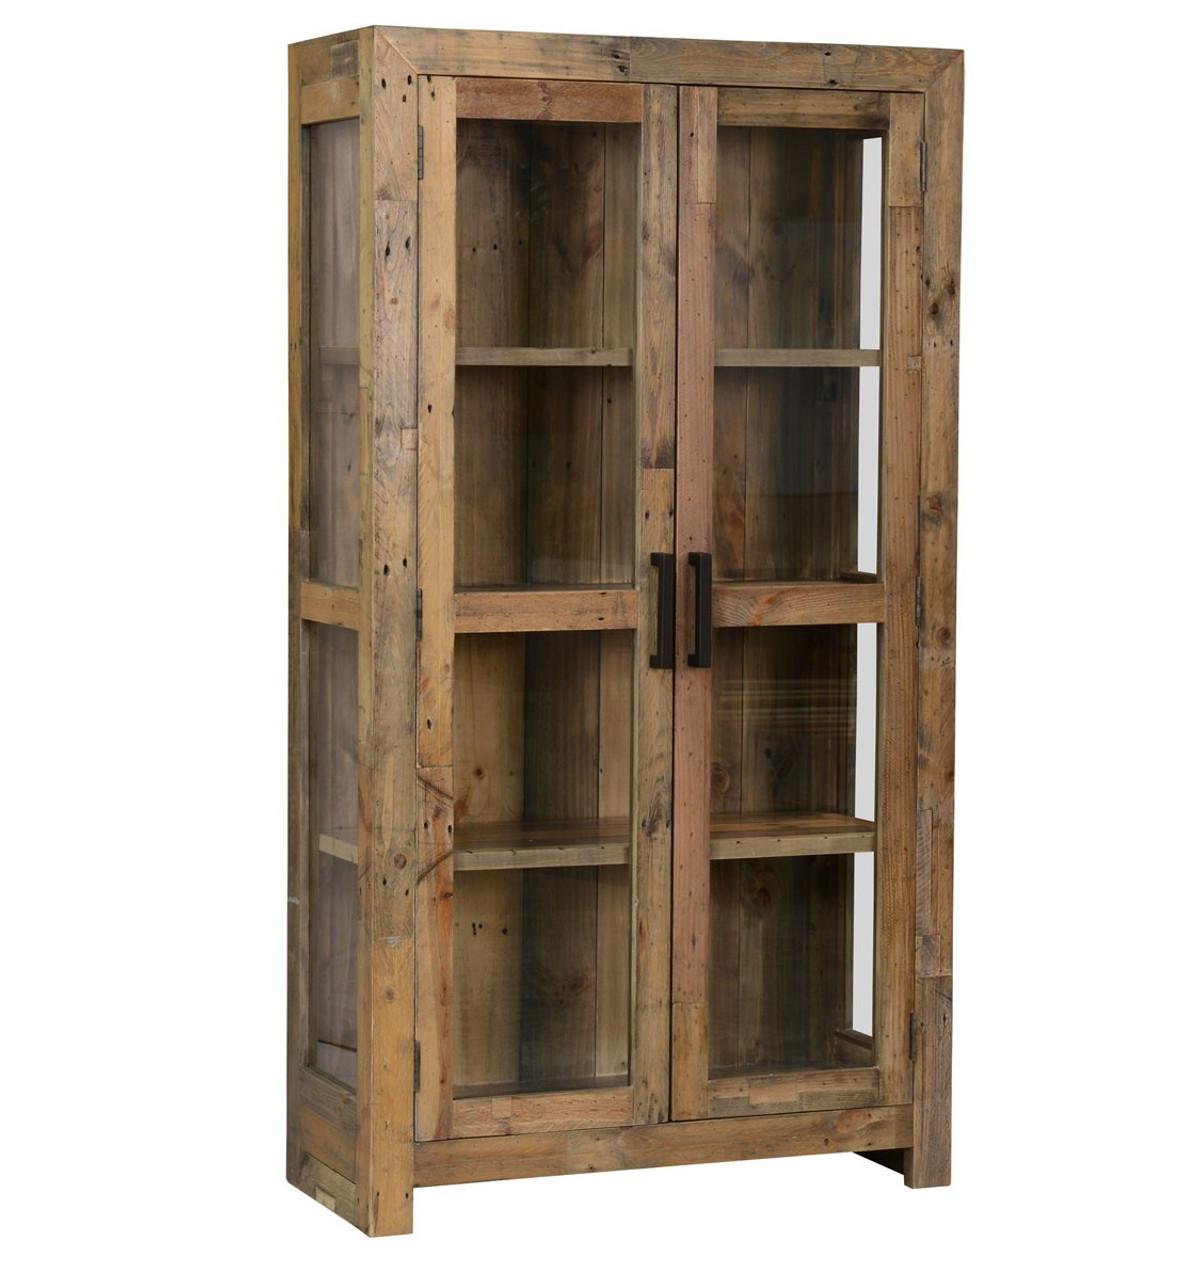 Angora Natural Reclaimed Wood Curio Cabinet